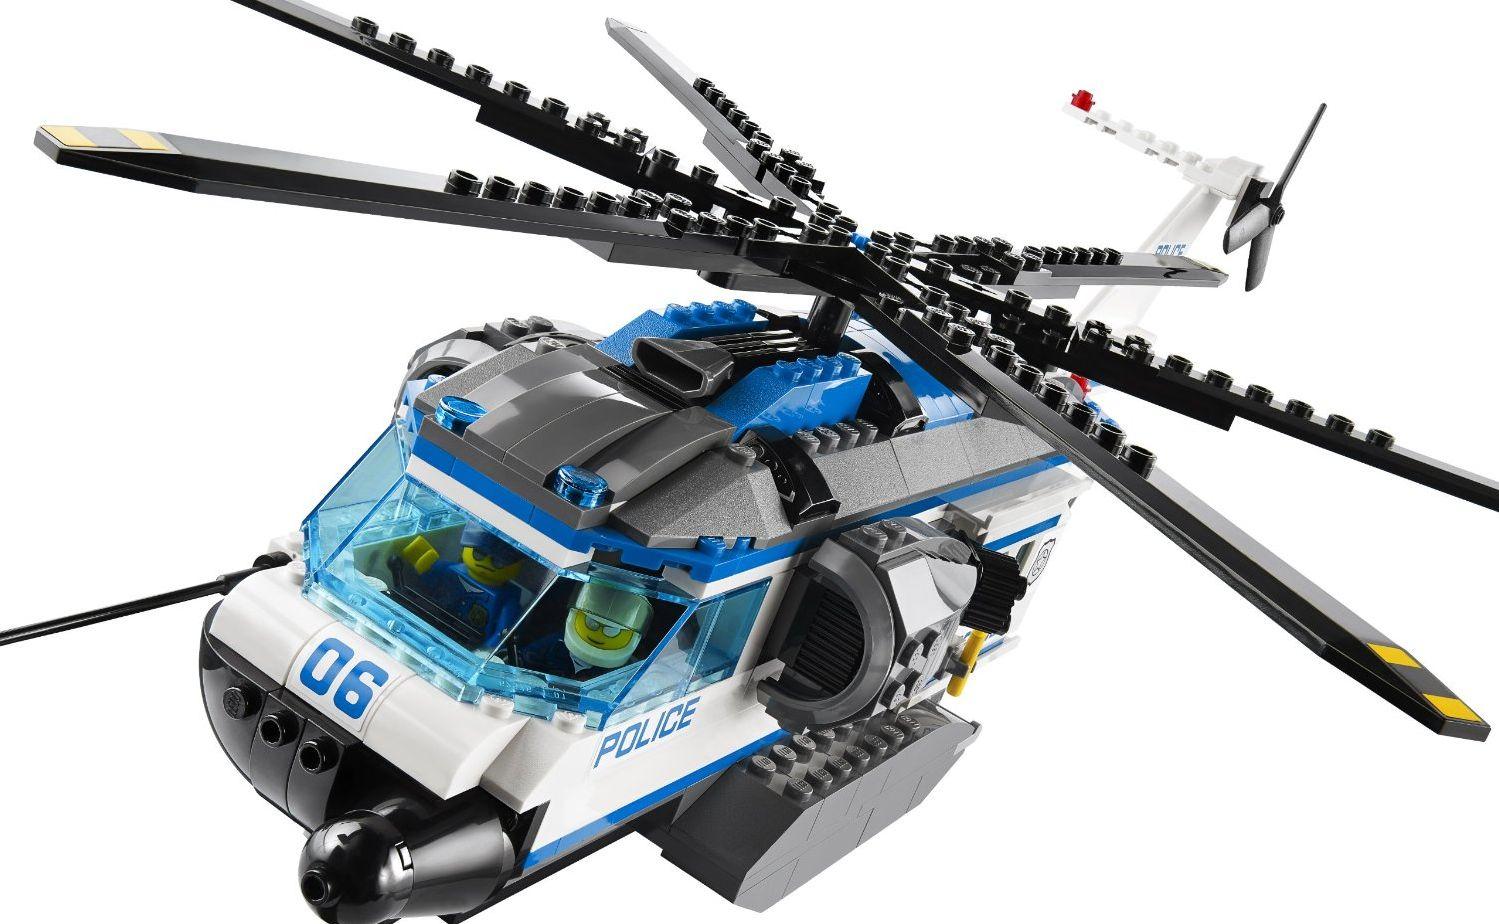 Lego 60046 – Helicopter Surveillance | i Brick City